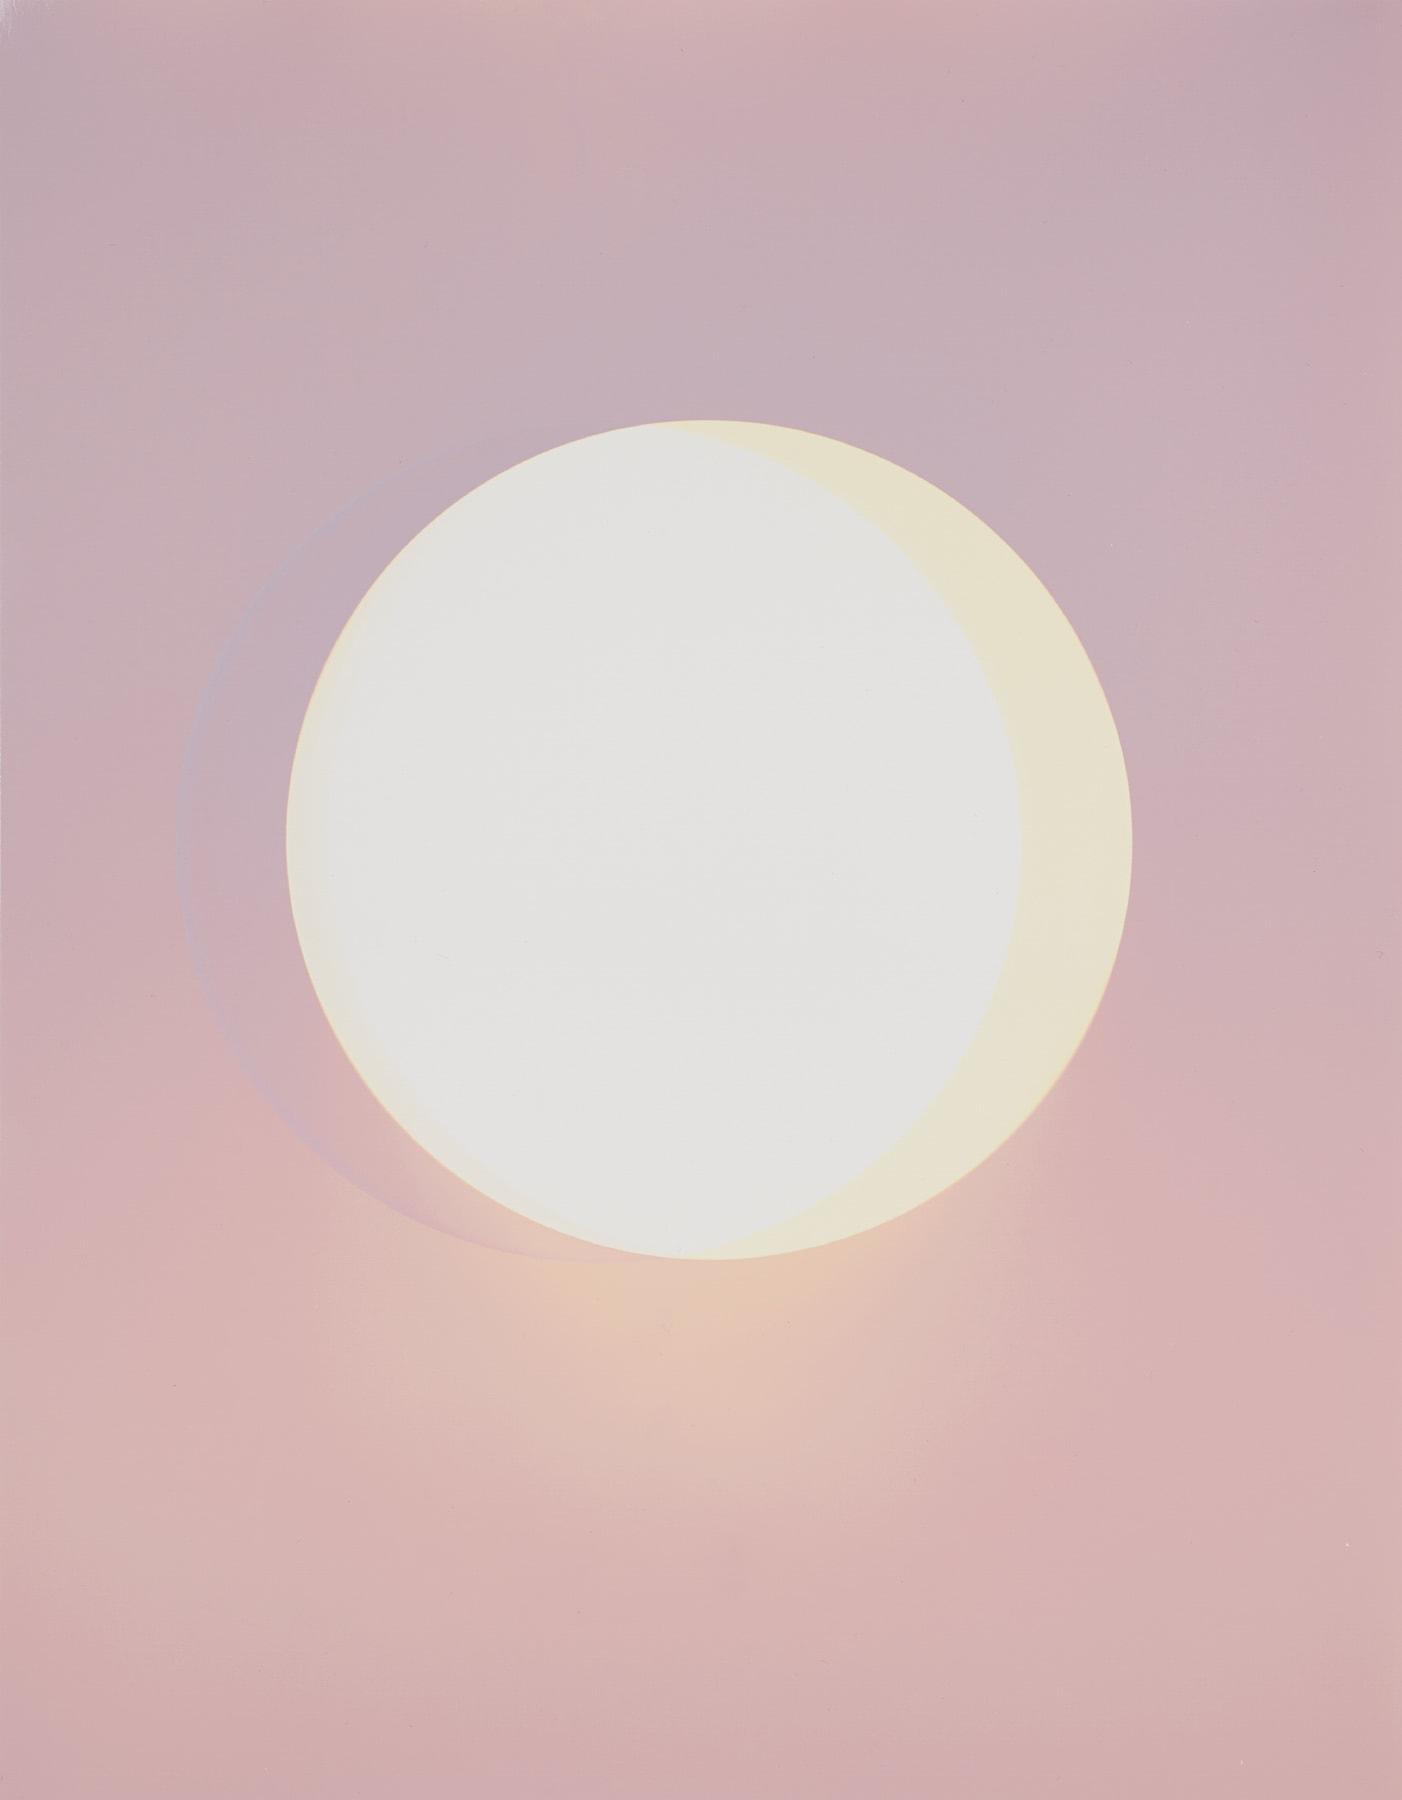 Rachelle Bussières abstract art lumen print